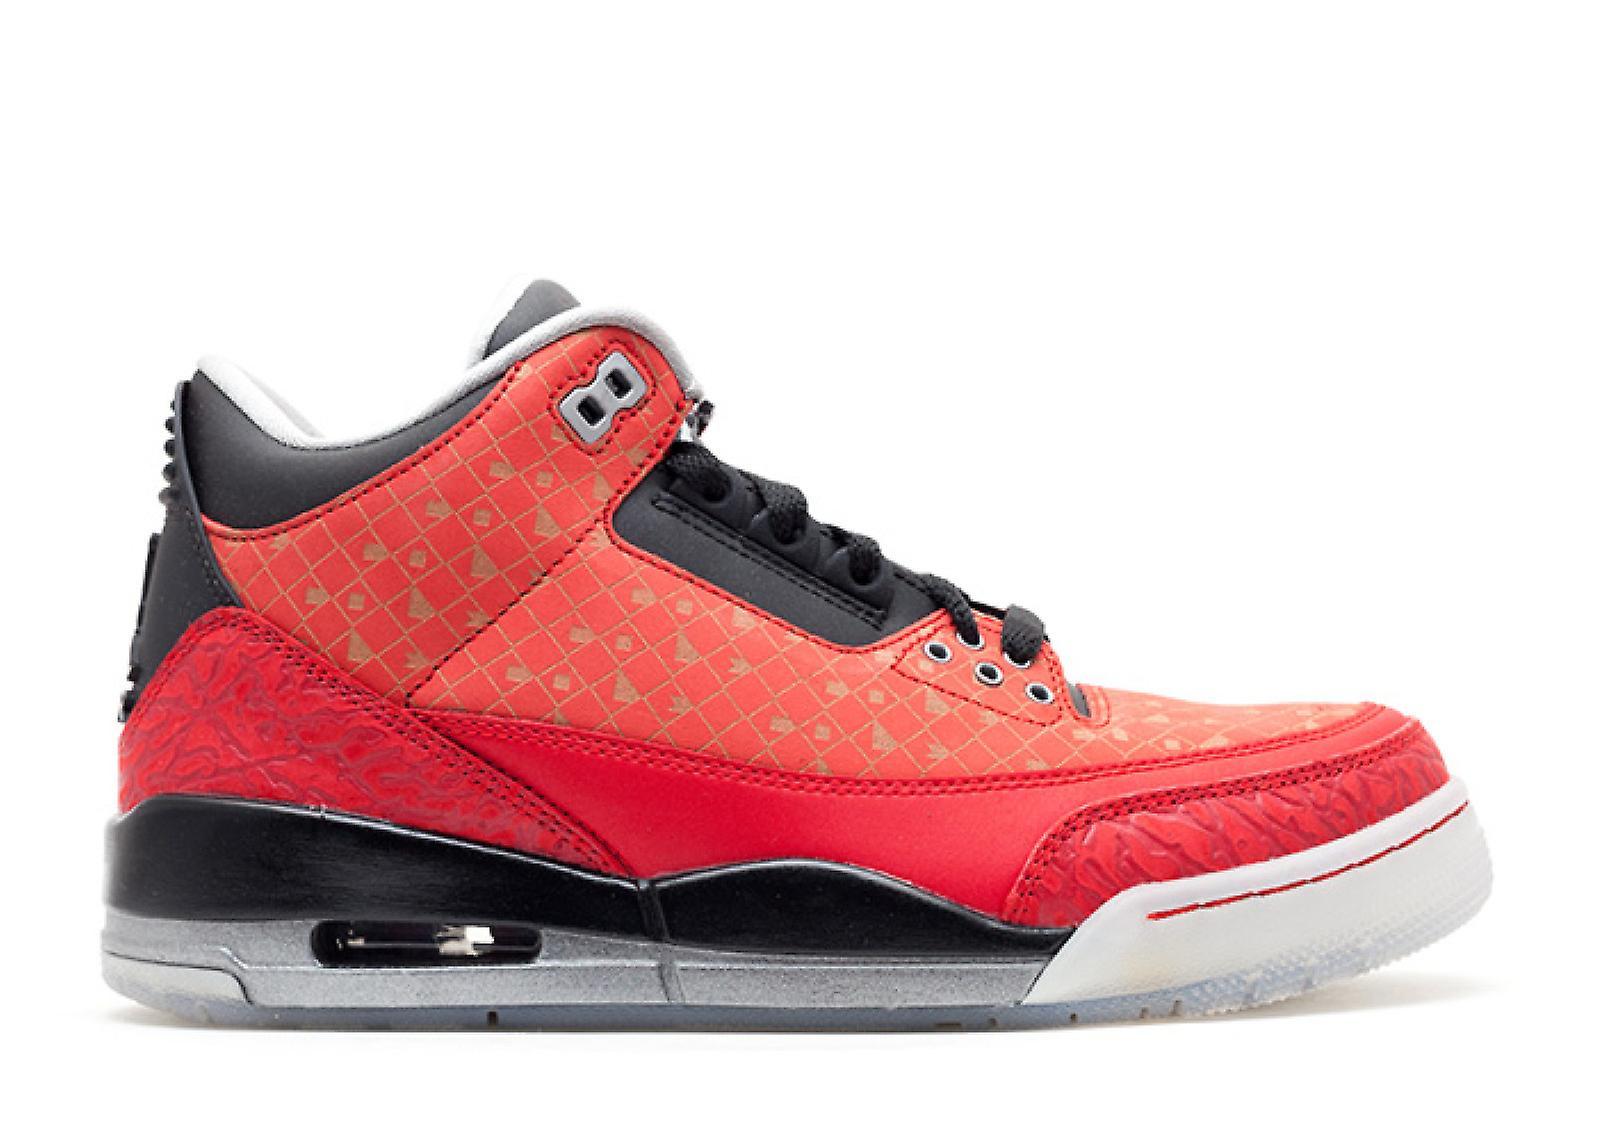 Air Jordan 3 Retro Db 'Doernbecher 2013' - 437536 - 600 - schoenen ubujIo